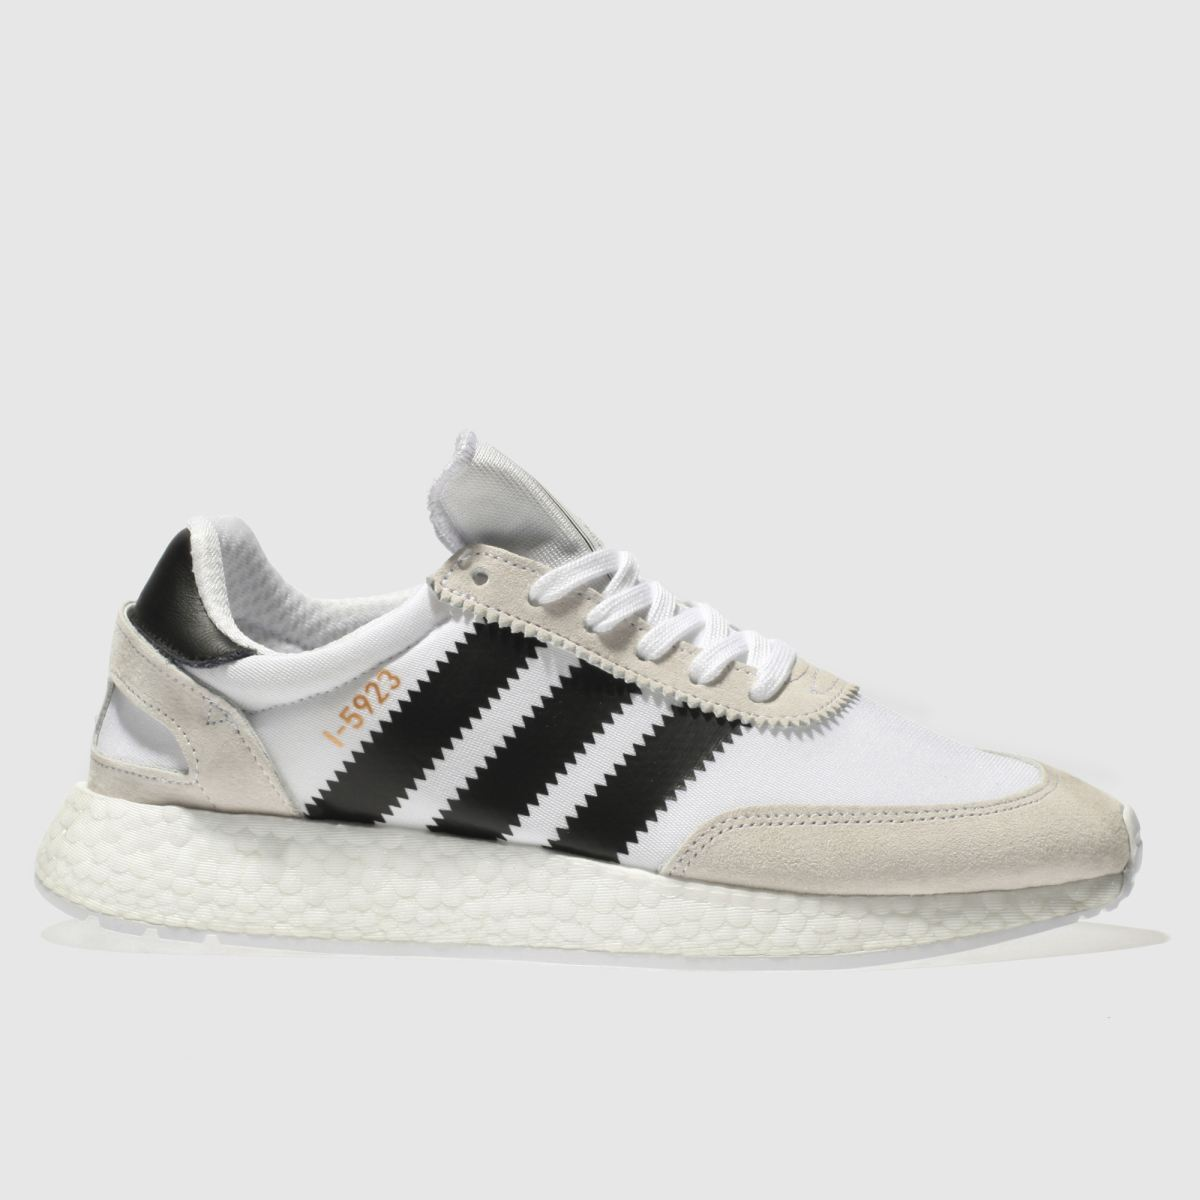 Adidas White & Black I-5923 Trainers